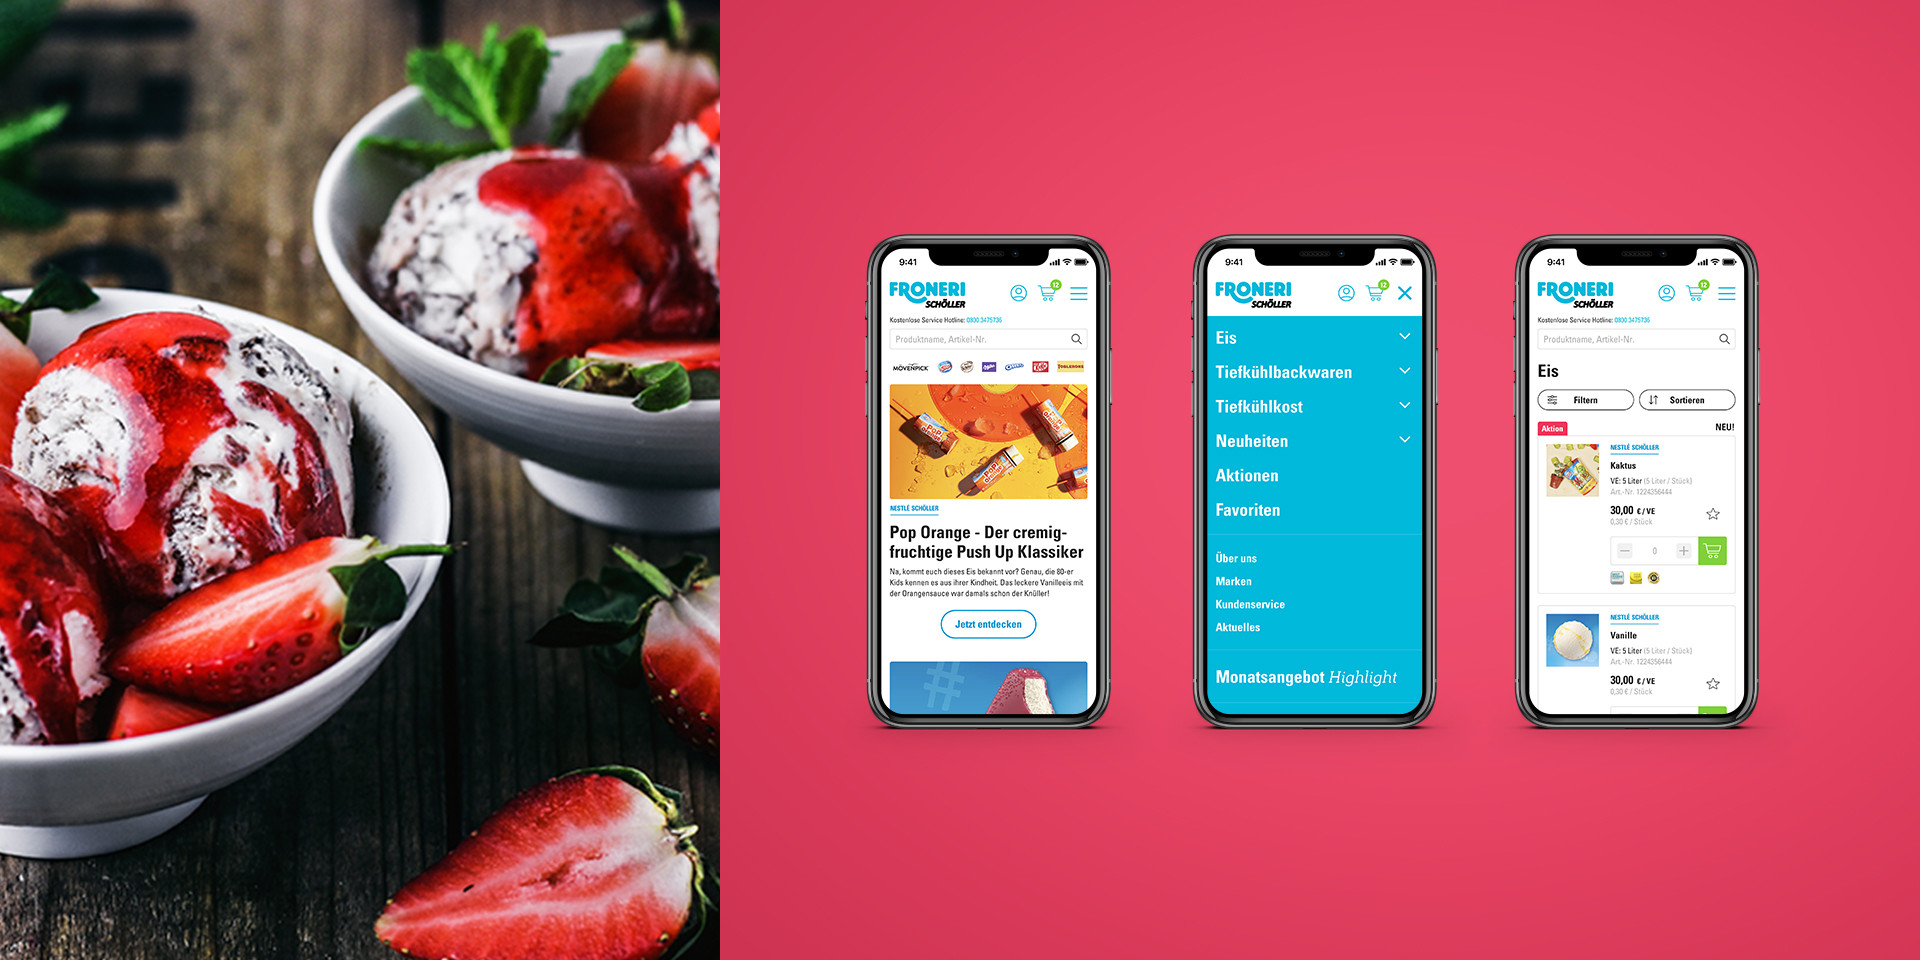 Mobile B2B-Onlineshop Froneri Schöller